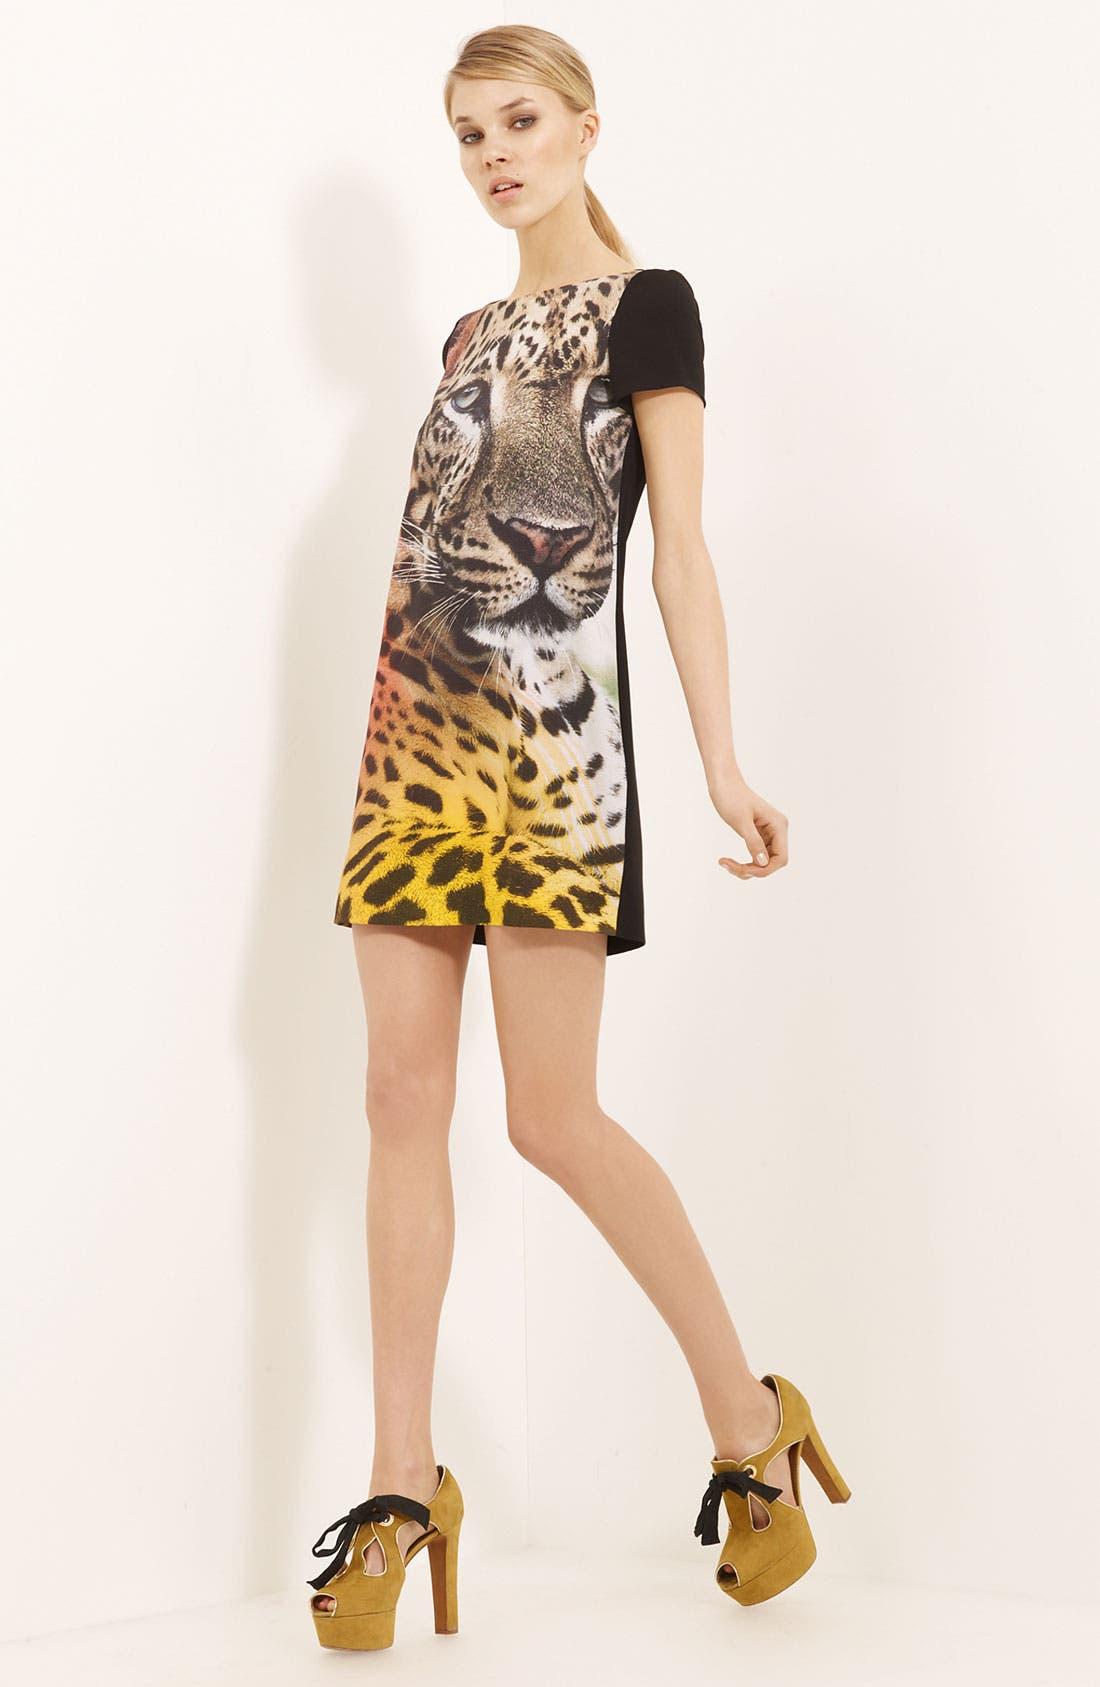 Main Image - Moschino Cheap & Chic Cheetah Print Crepe Dress